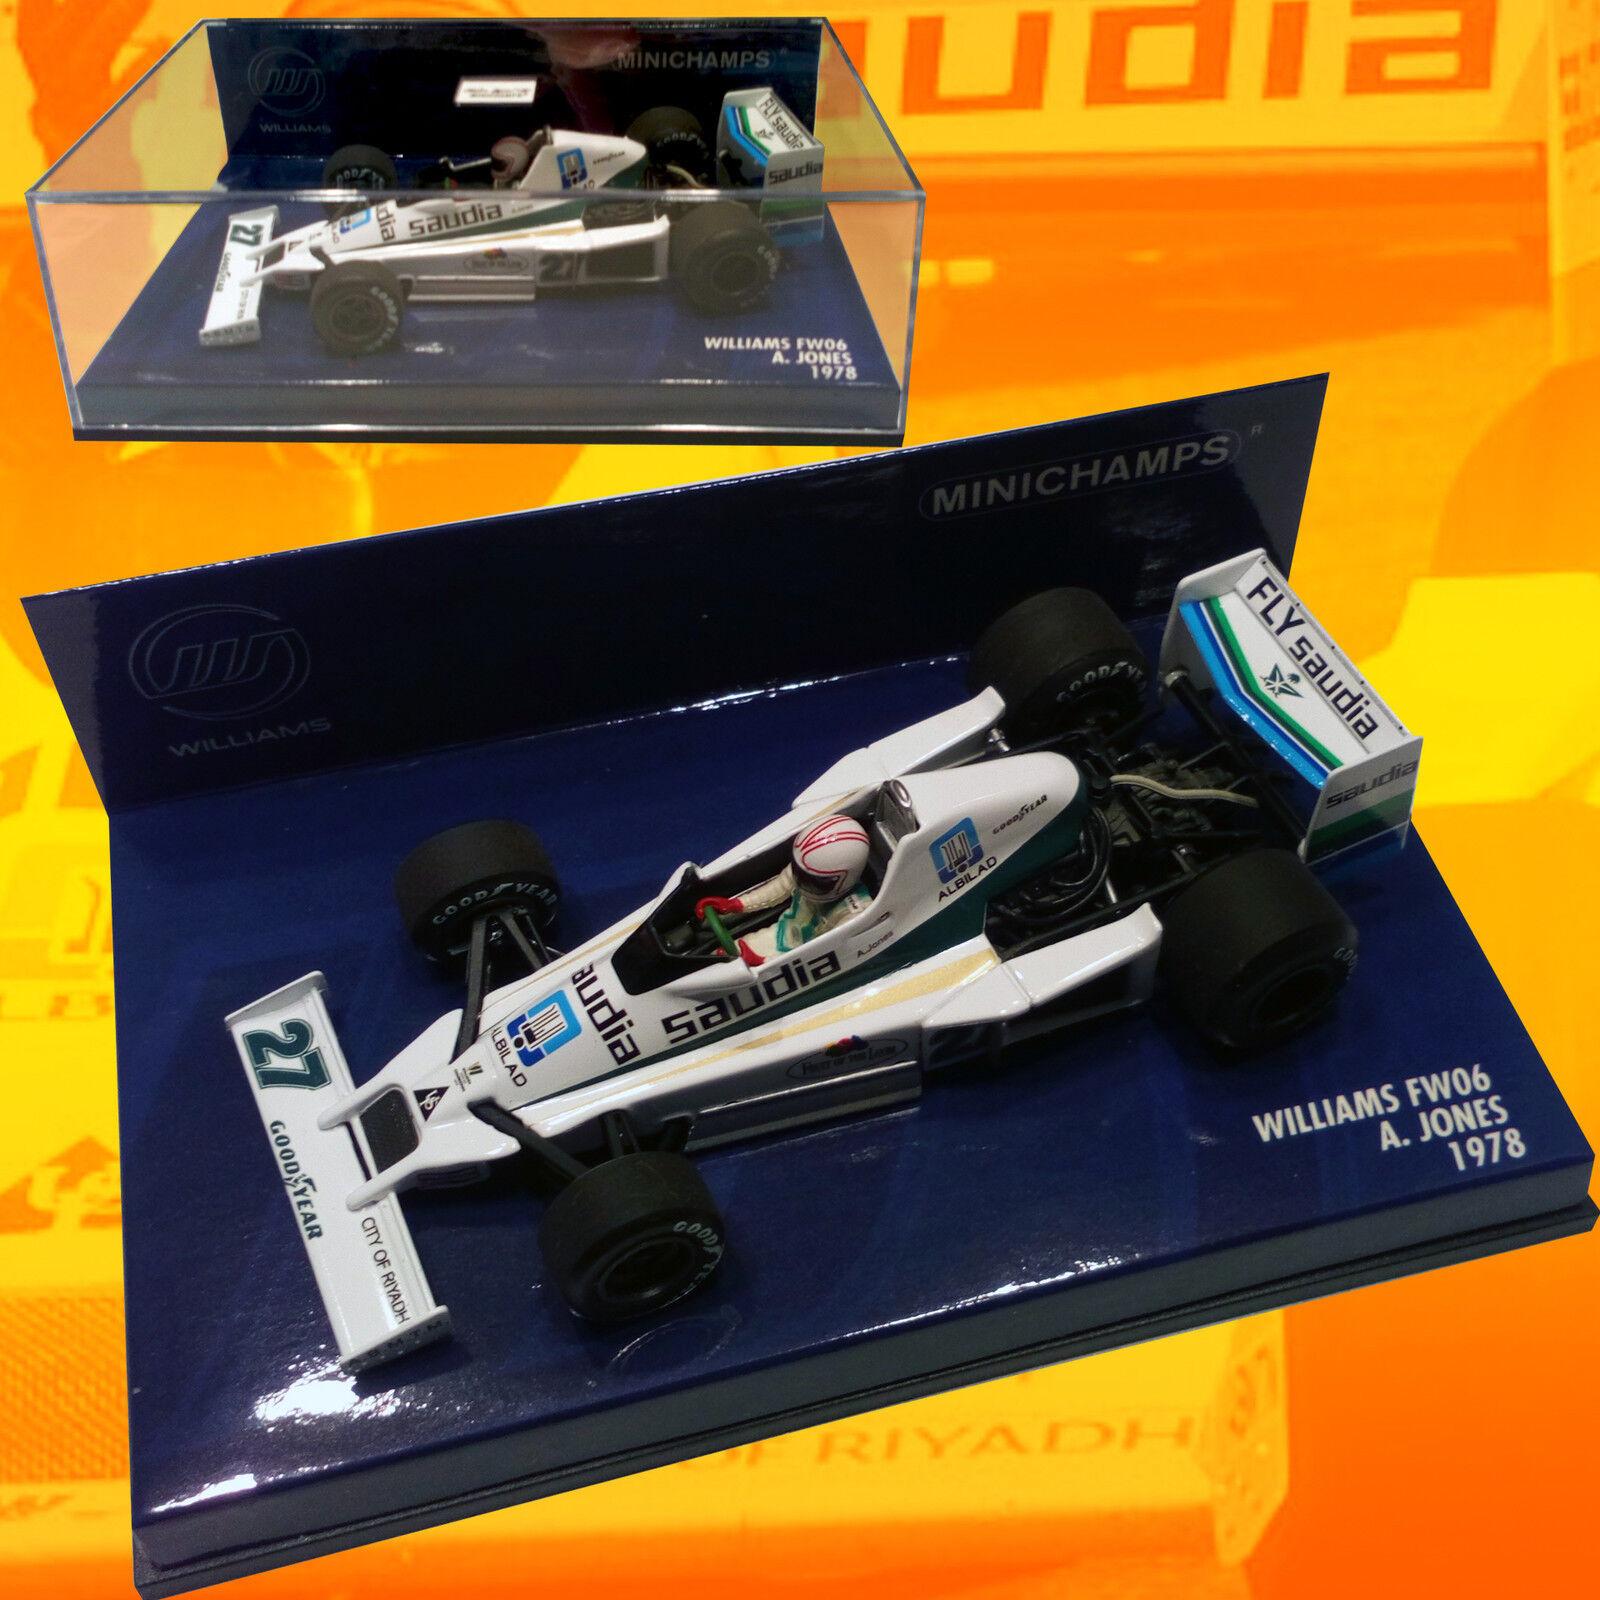 129) Minichamps - Williams FW06 Alan Jones 1978 - Sold out